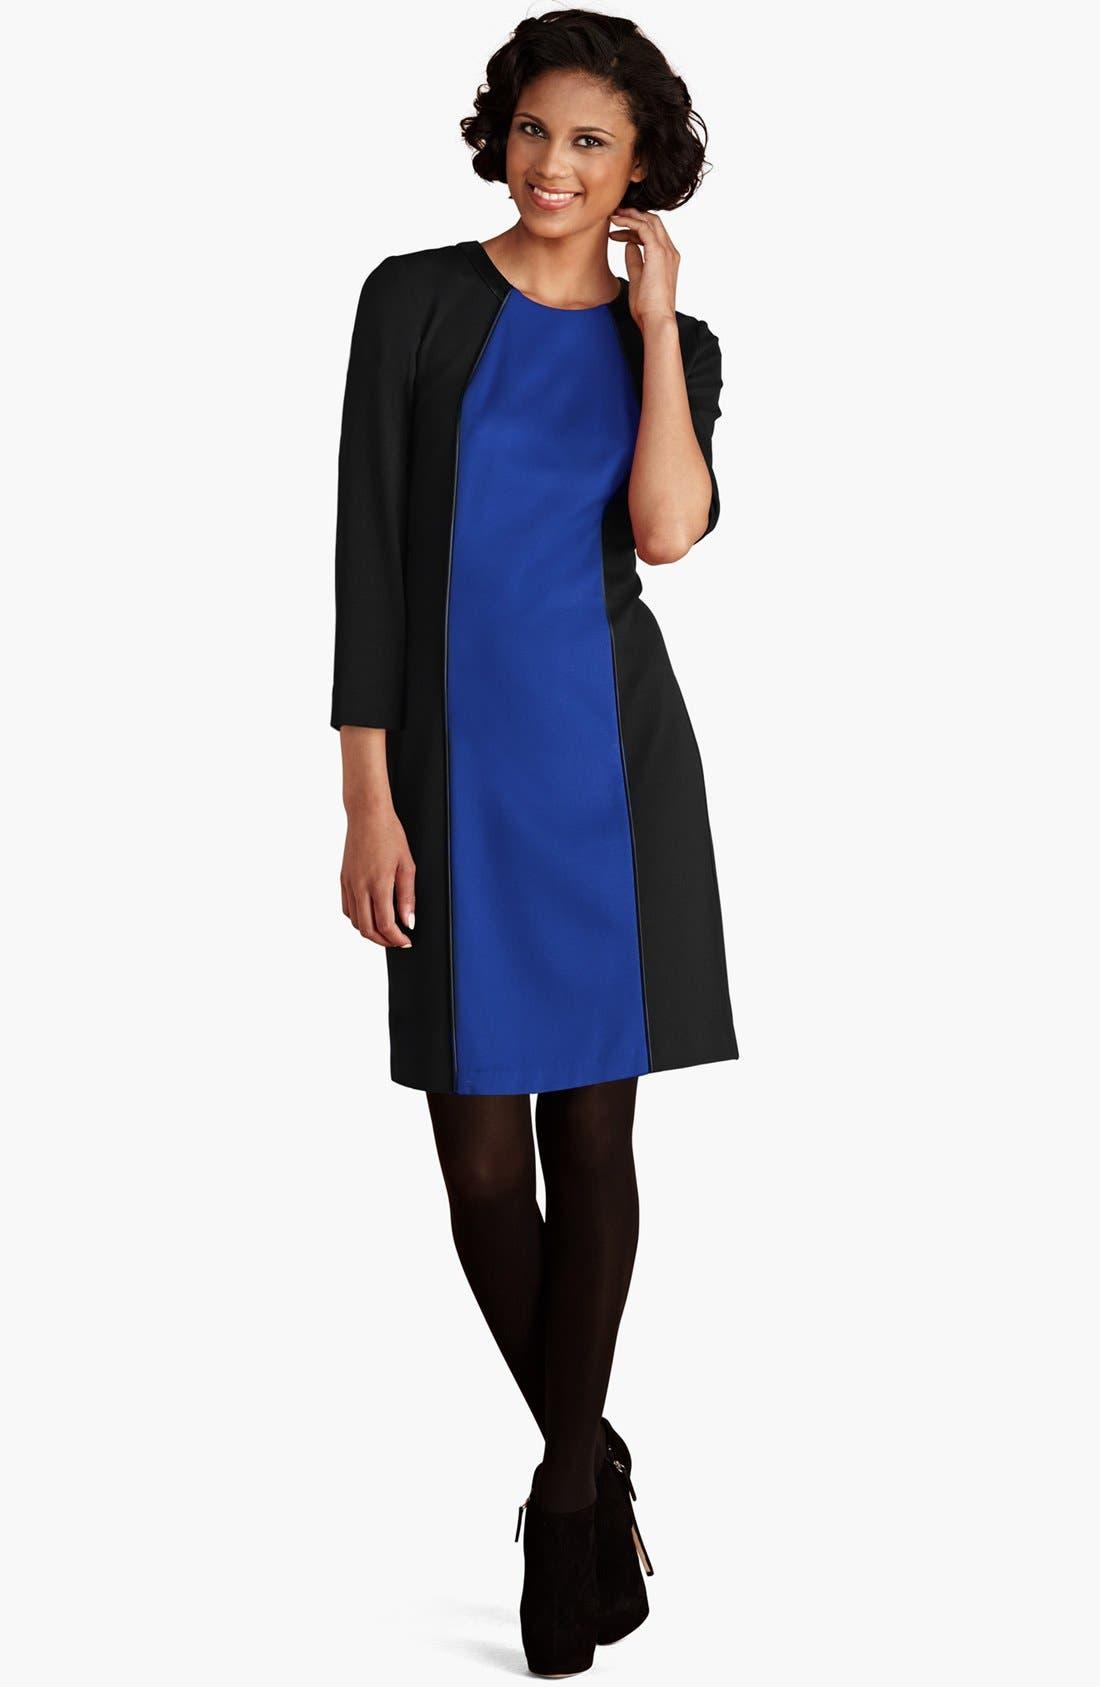 Main Image - Donna Morgan Faux Leather Trim Colorblock Dress